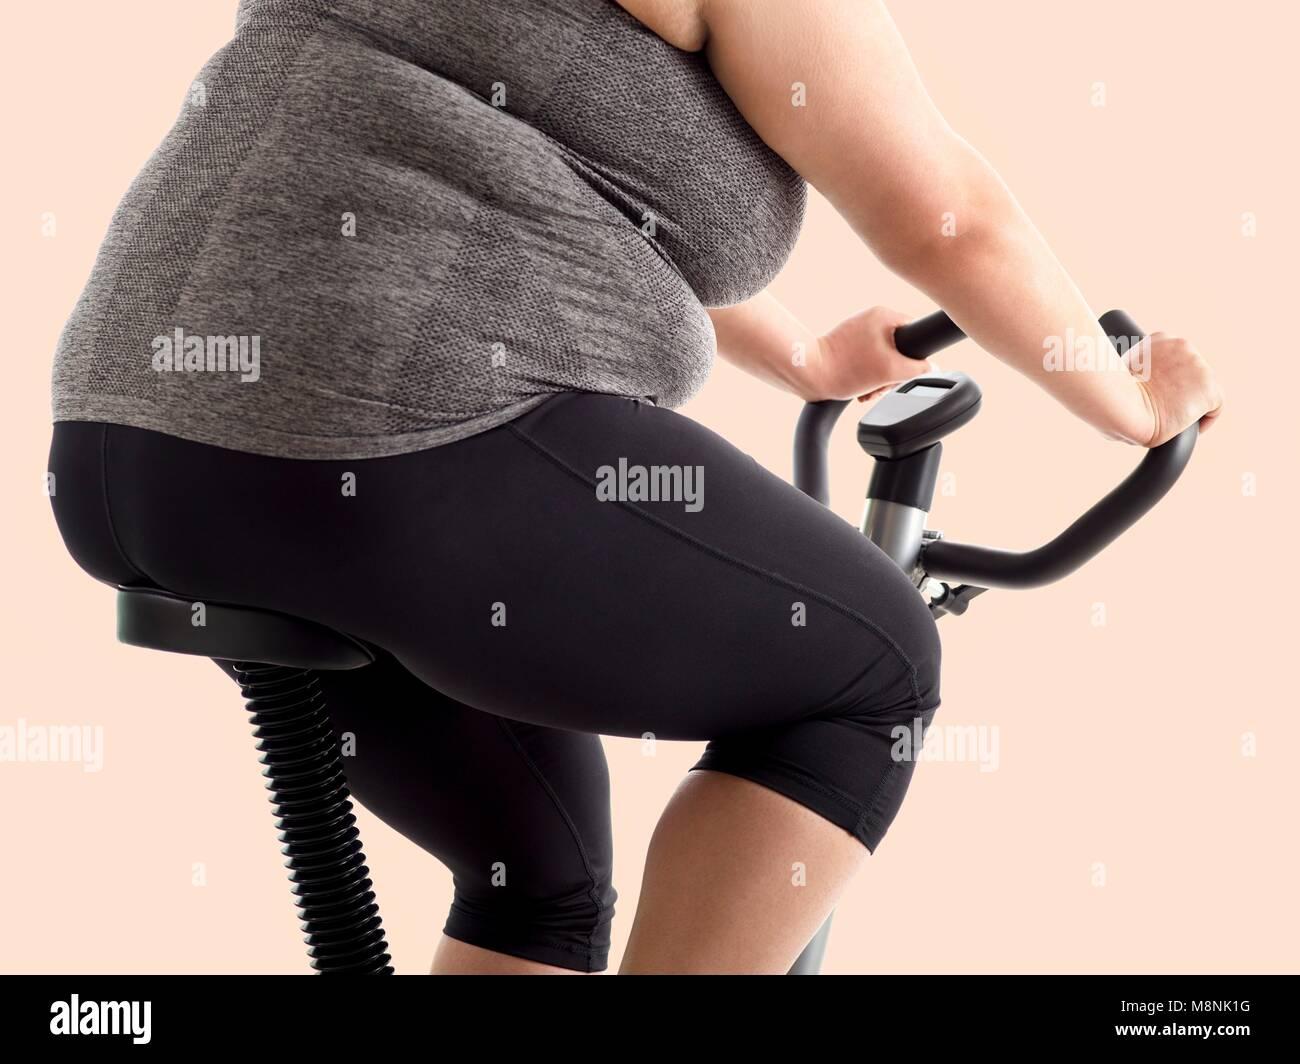 Overweight woman on exercise bike. - Stock Image